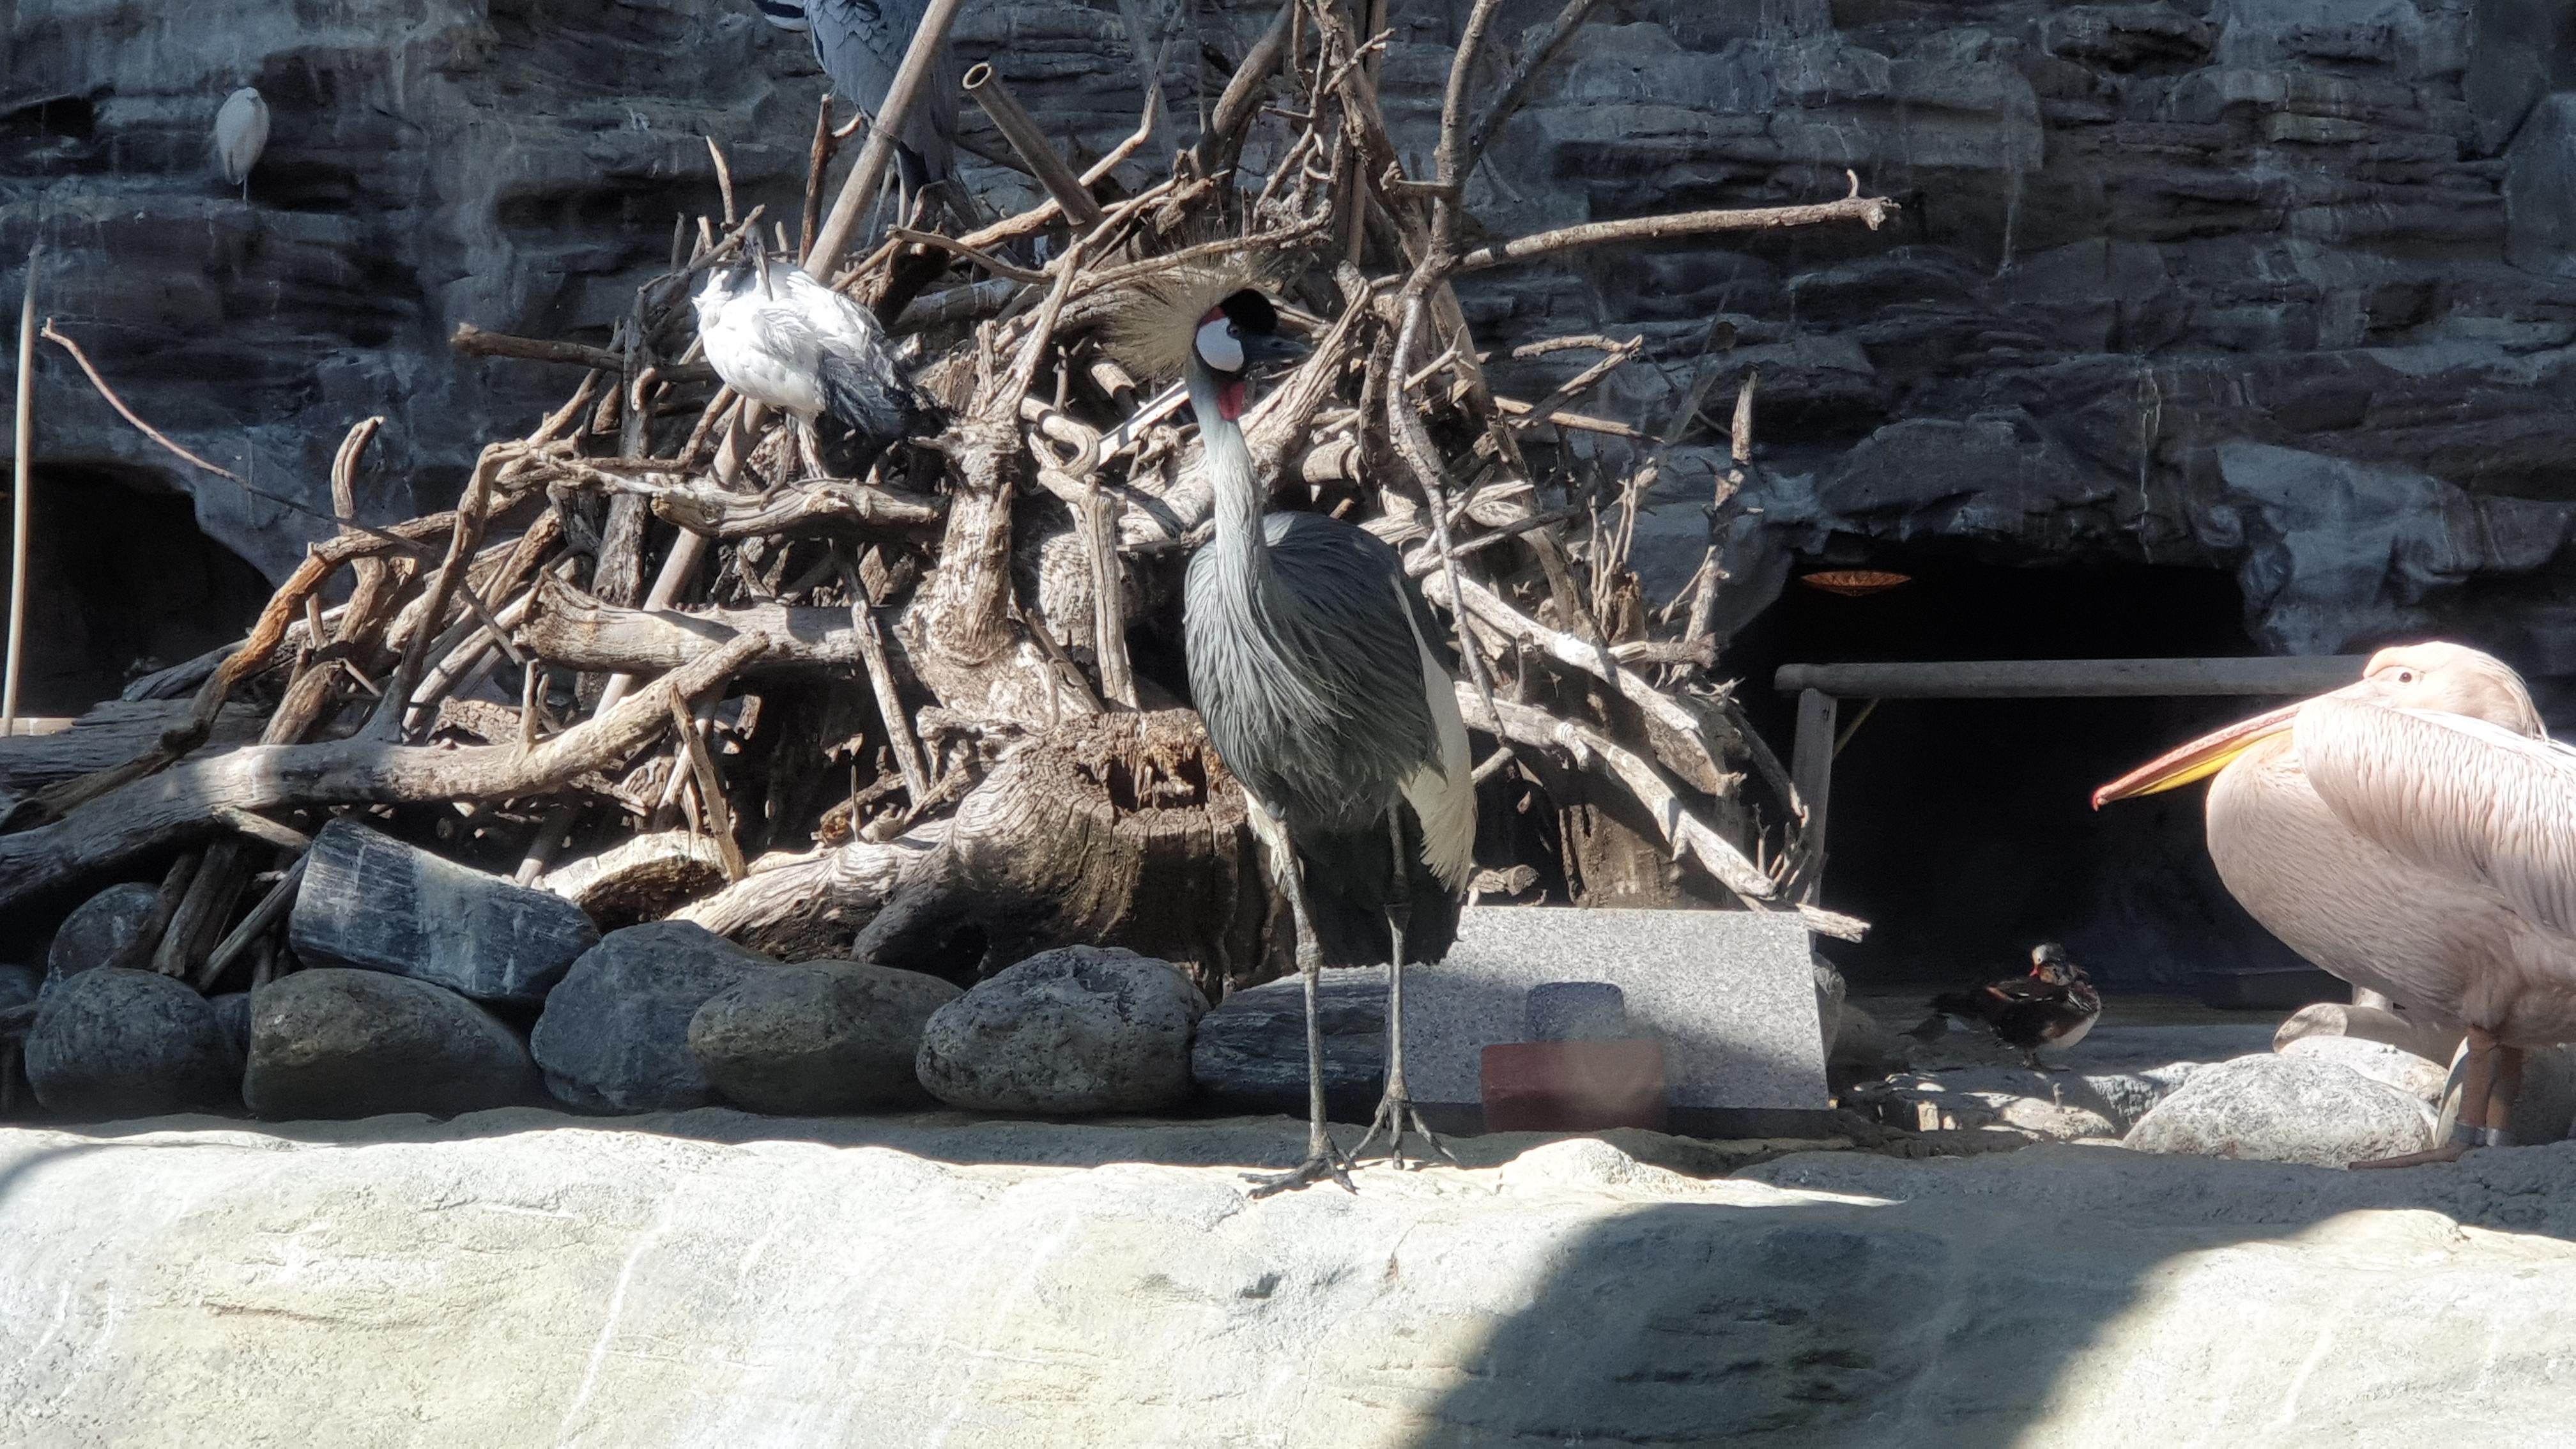 crowned crane, 광대 두루미, 두루미 머리, 두루미 머리의 실체, 봄바람, 어린이대공원, 어린이대공원 관머리 두루미, 어린이대공원 두루미, 어린이대공원 물새관, 어린이대공원 새, 어린이대공원 왕관두루미, 어린이대공원 원앙, 어린이대공원 펠리칸, 어린이대공원 학, 어린이대공원에 놀러갔습니다. #물새관 - 생각보다 재밌었음., 원앙, 원앙 수영, 원앙 헤엄, 조류, 조류 뼈, 환공포증